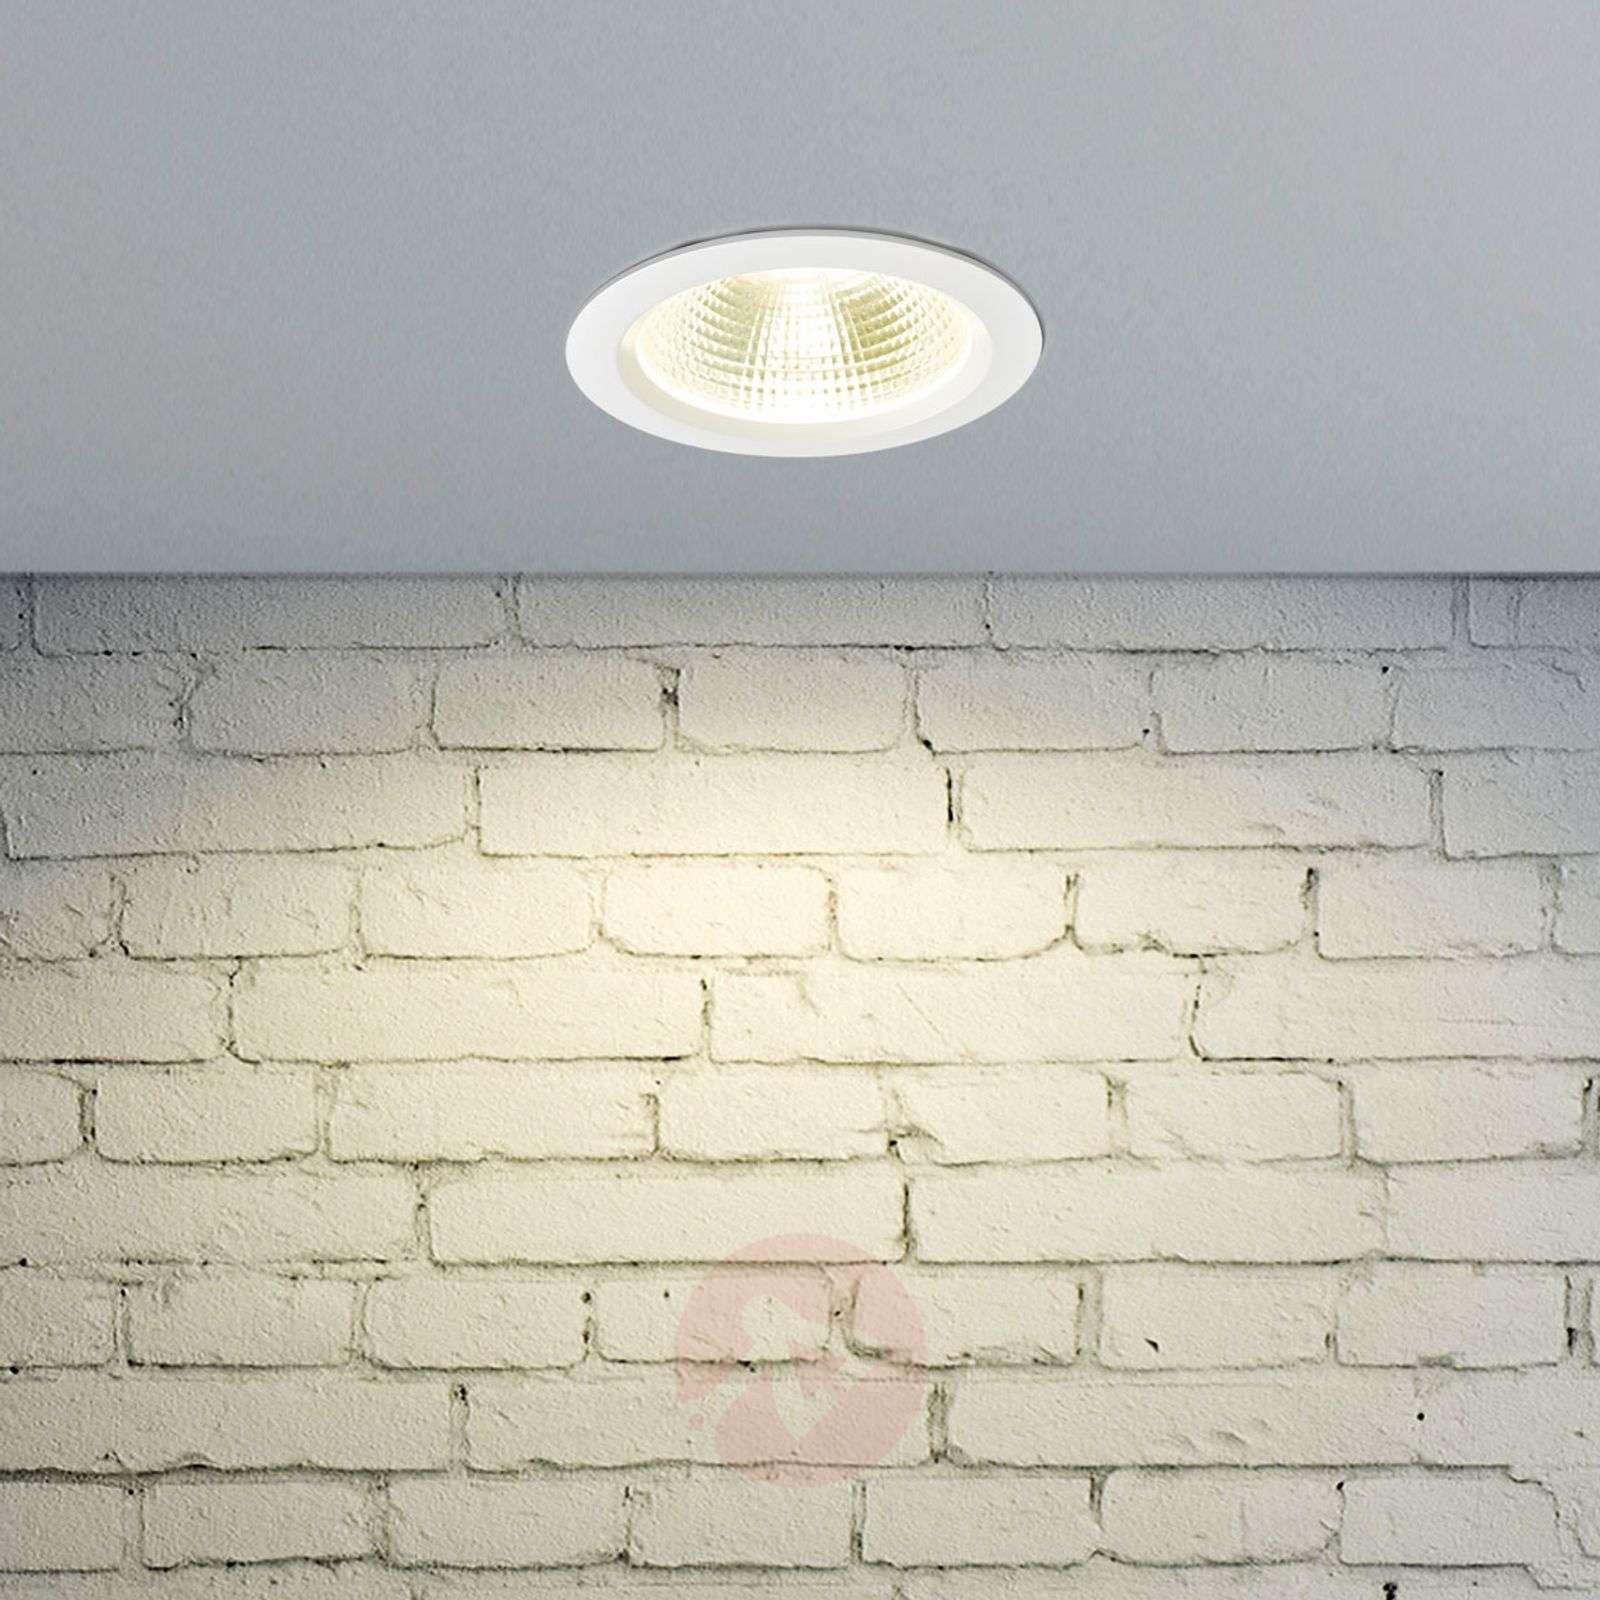 Kylpyhuoneen LED-uppokohdevalo Tadeus, LED, IP65-9966025-05